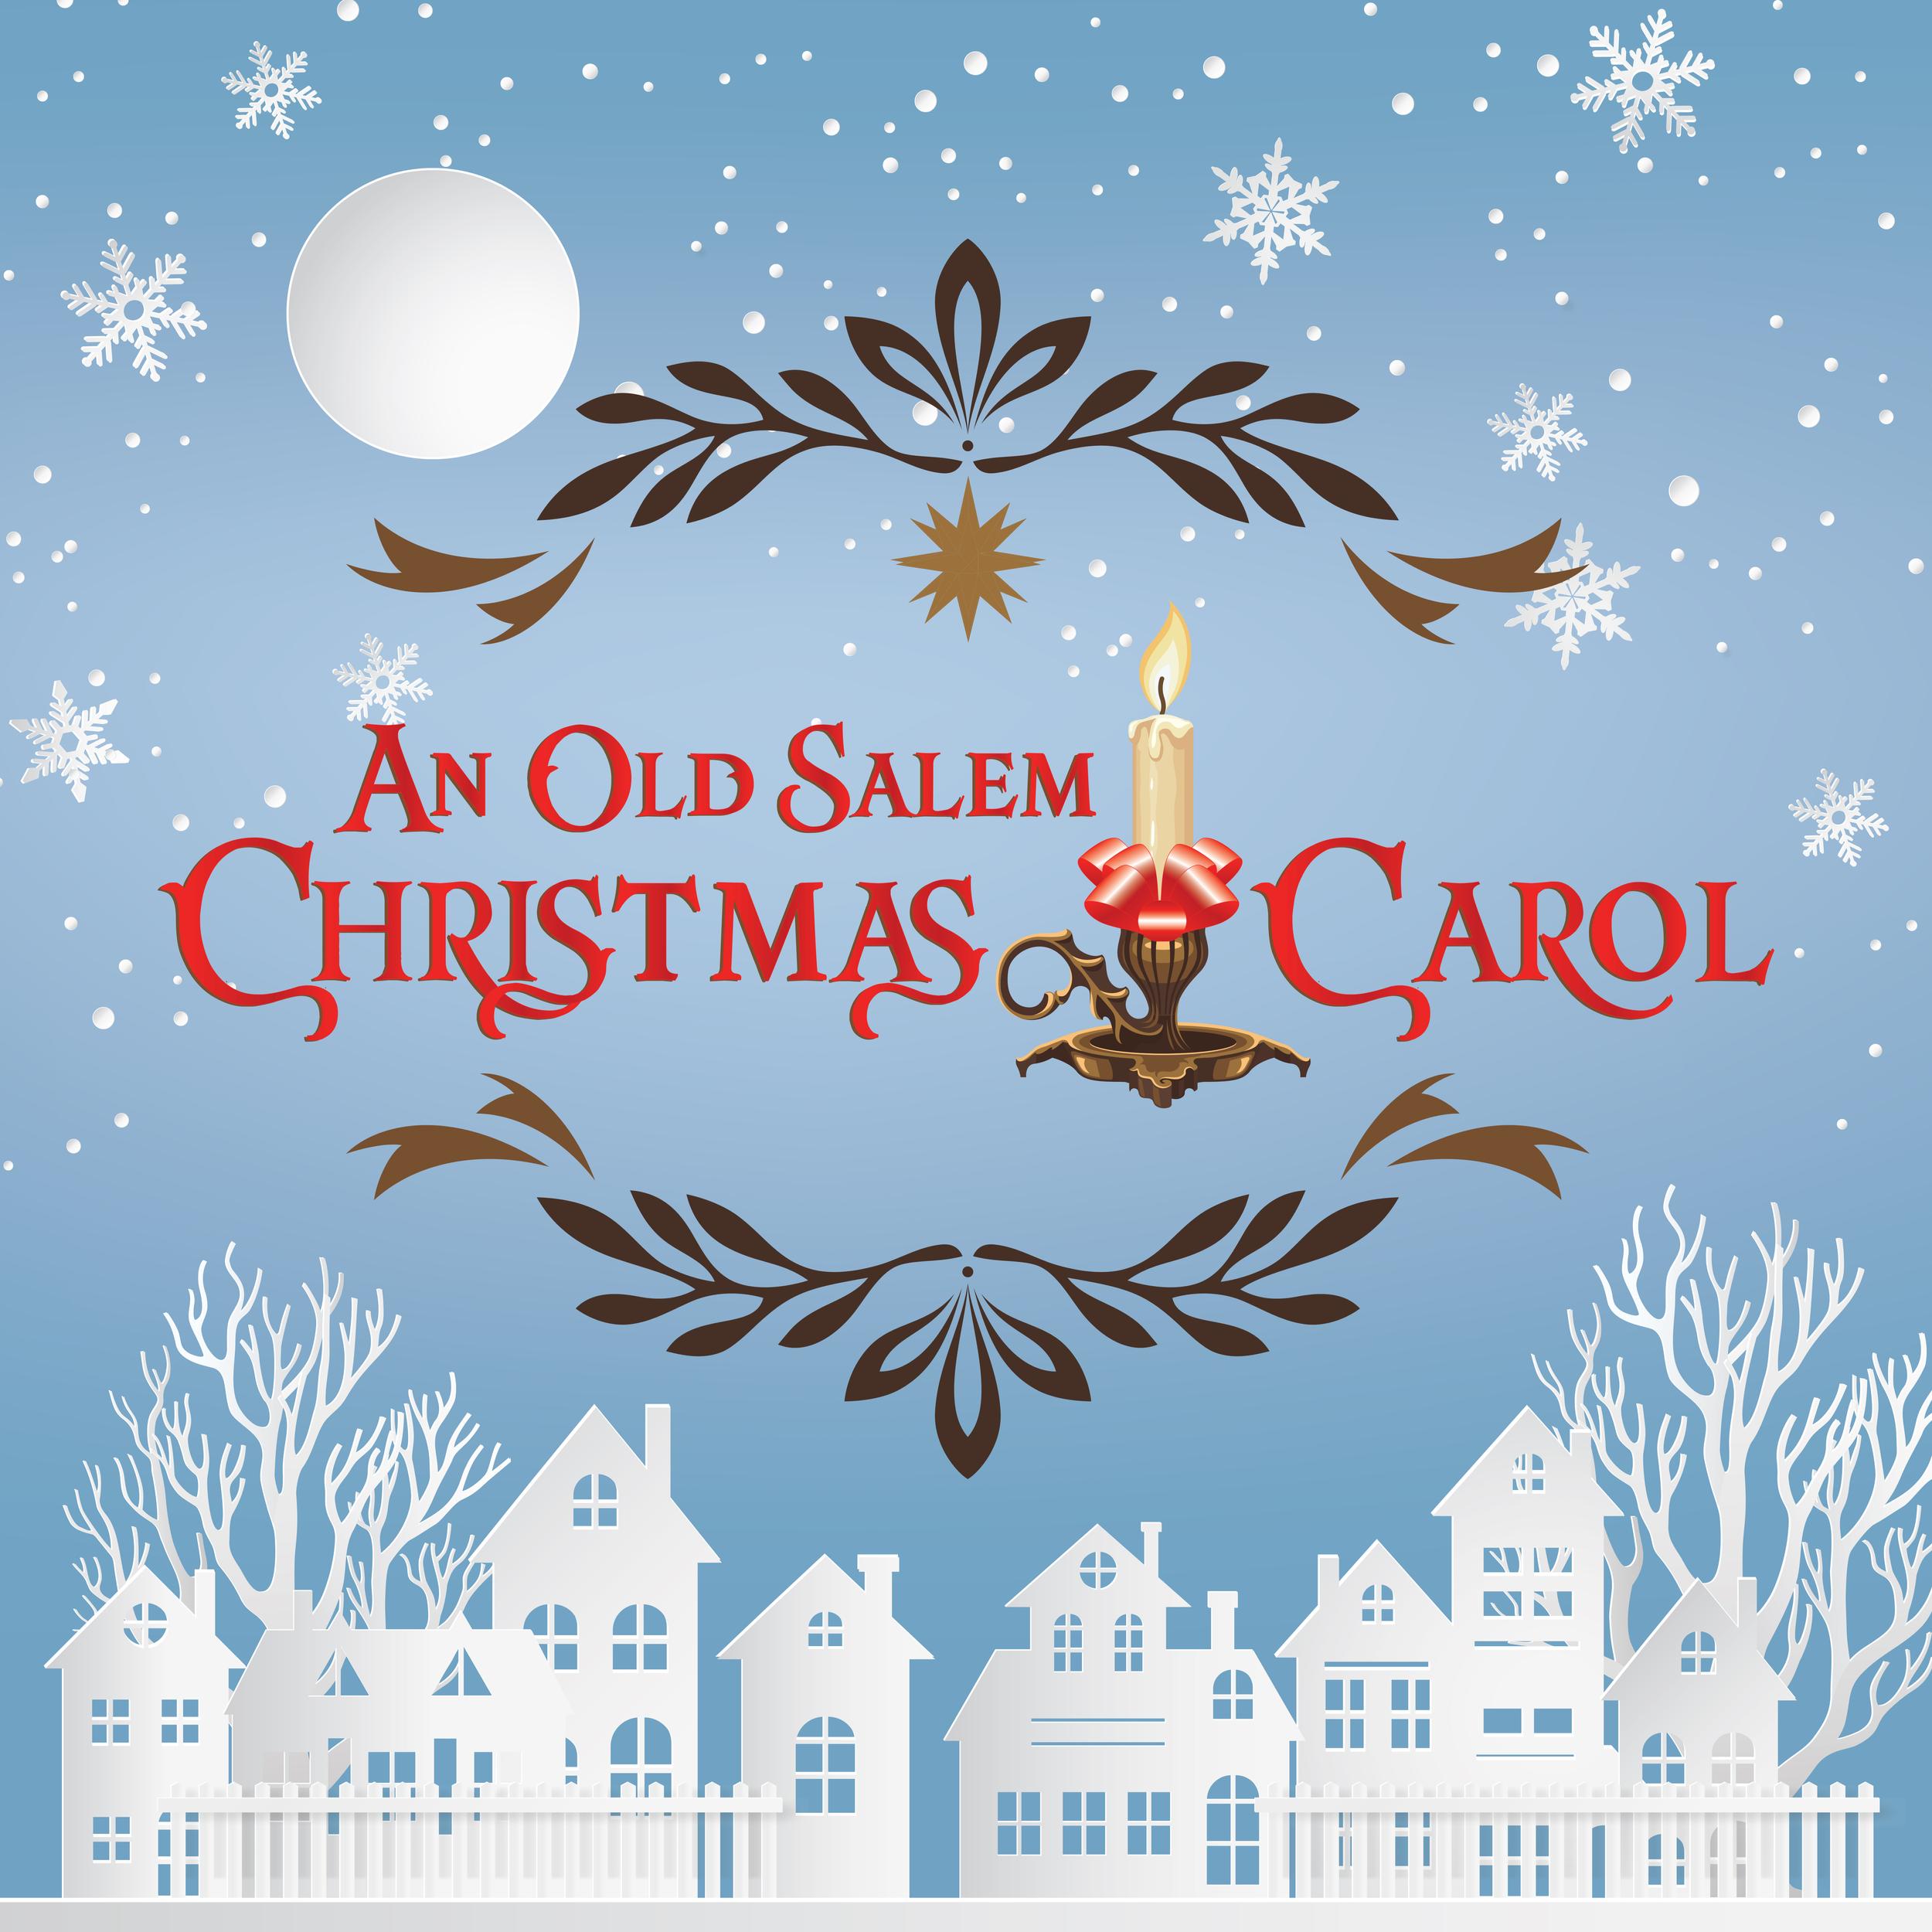 Winston Salem Christmas Carol 2020 An Old Salem Christmas Carol 2019 | Little Theatre of WS